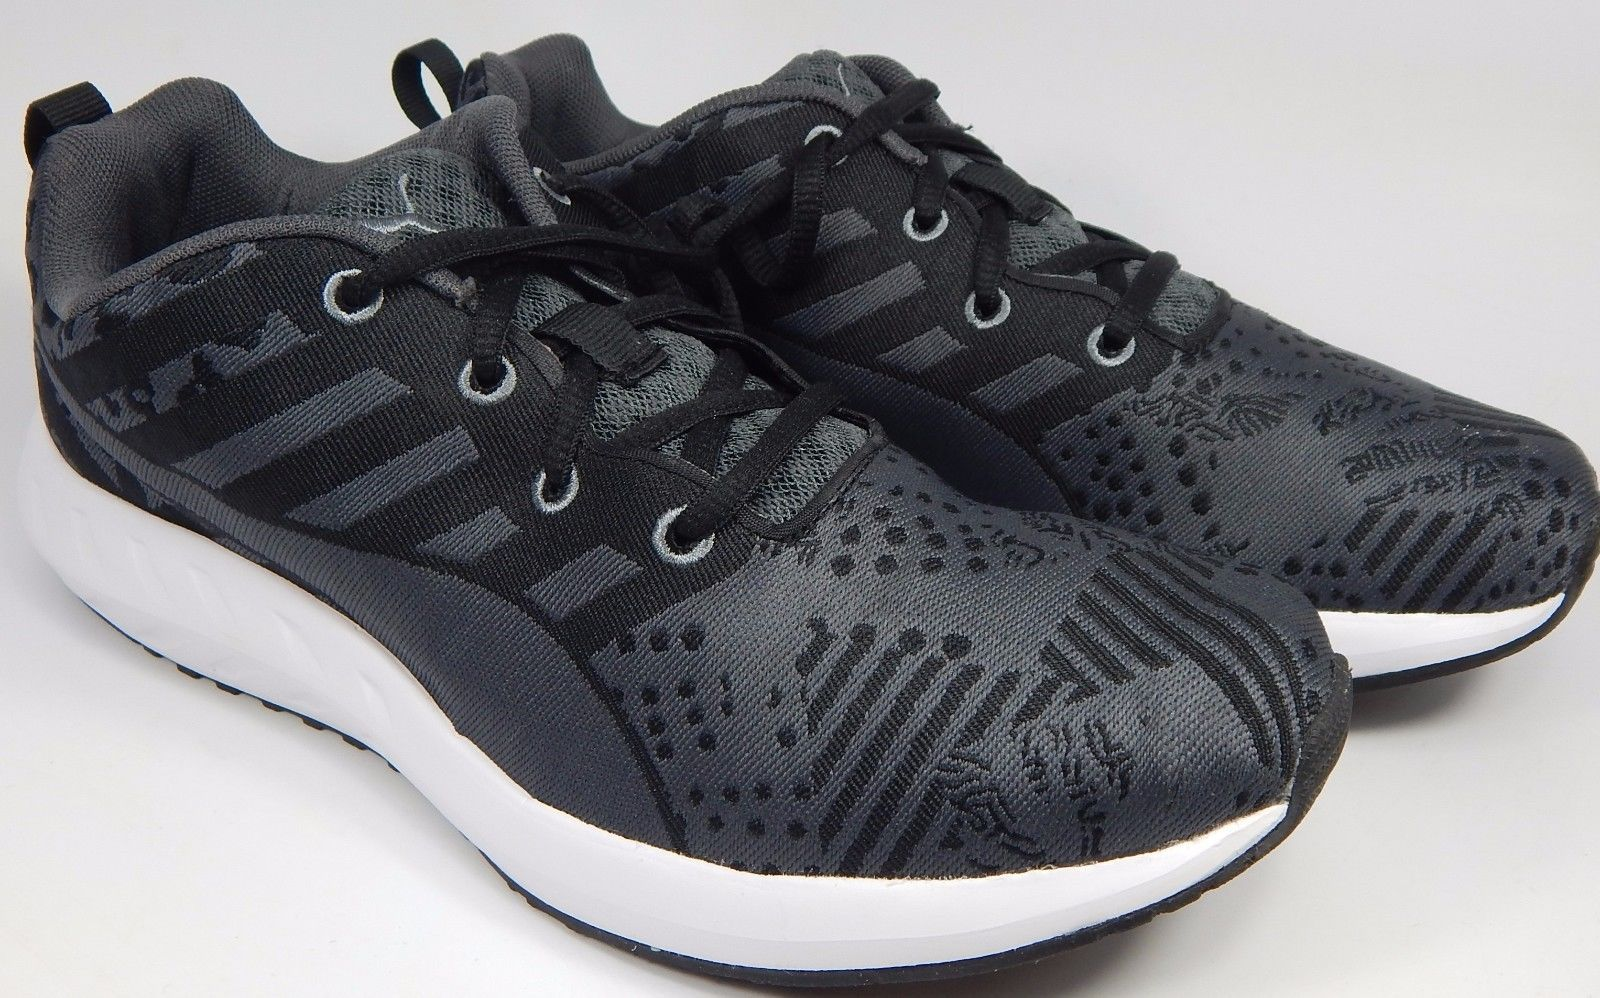 PUMA Flare Woven Black Periscope Women's Running Shoes Size US 9.5 M (B) EU 40.5